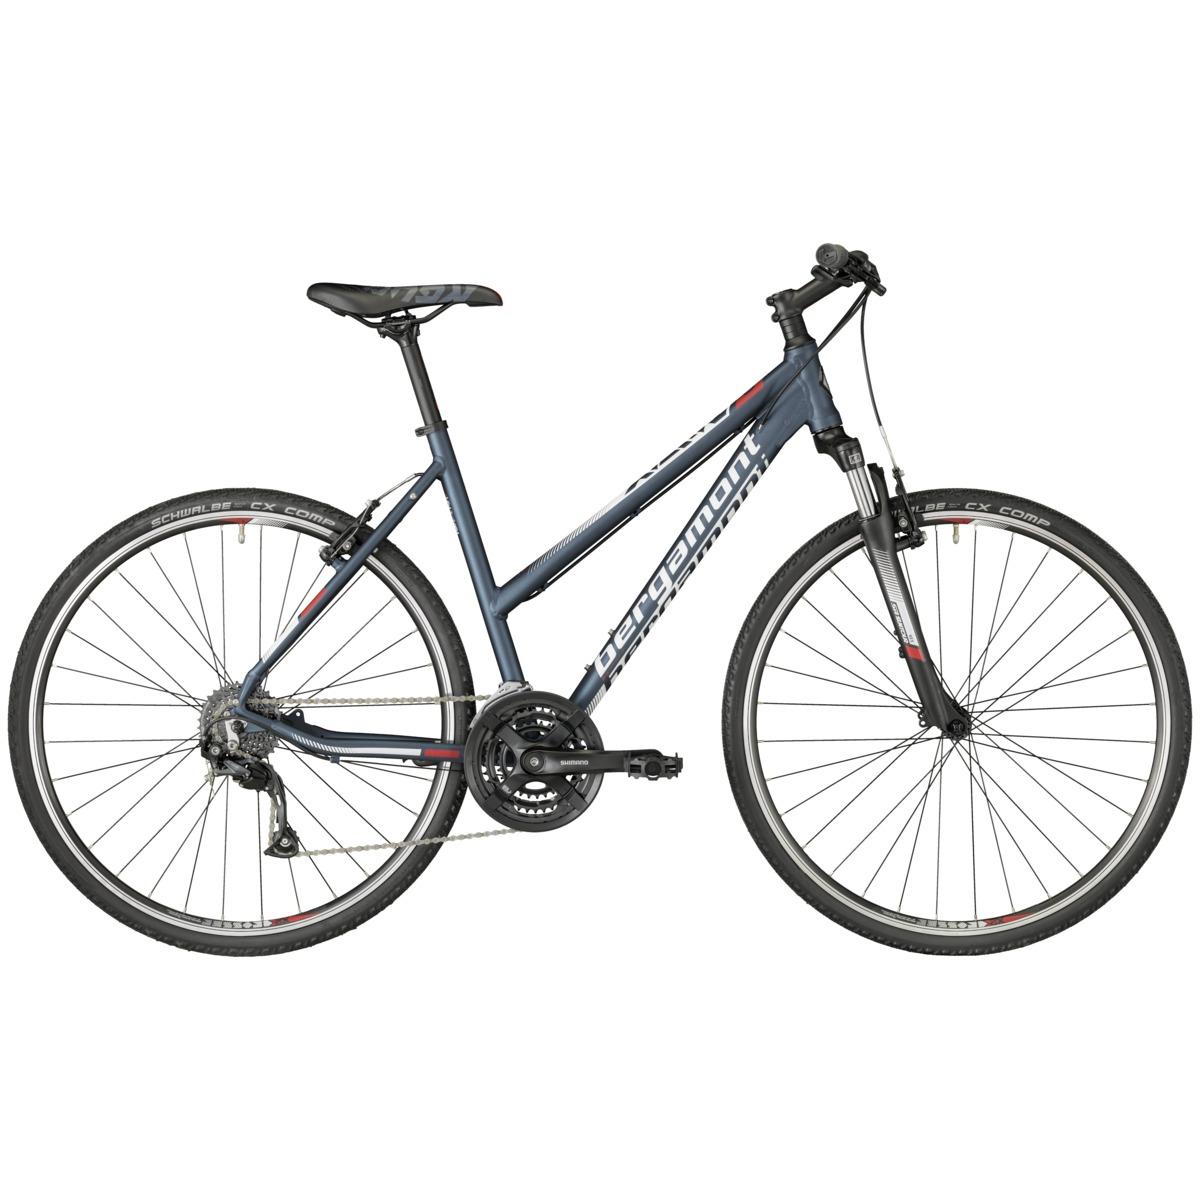 bergamont helix 3 0 damen cross trekking fahrrad blau wei. Black Bedroom Furniture Sets. Home Design Ideas